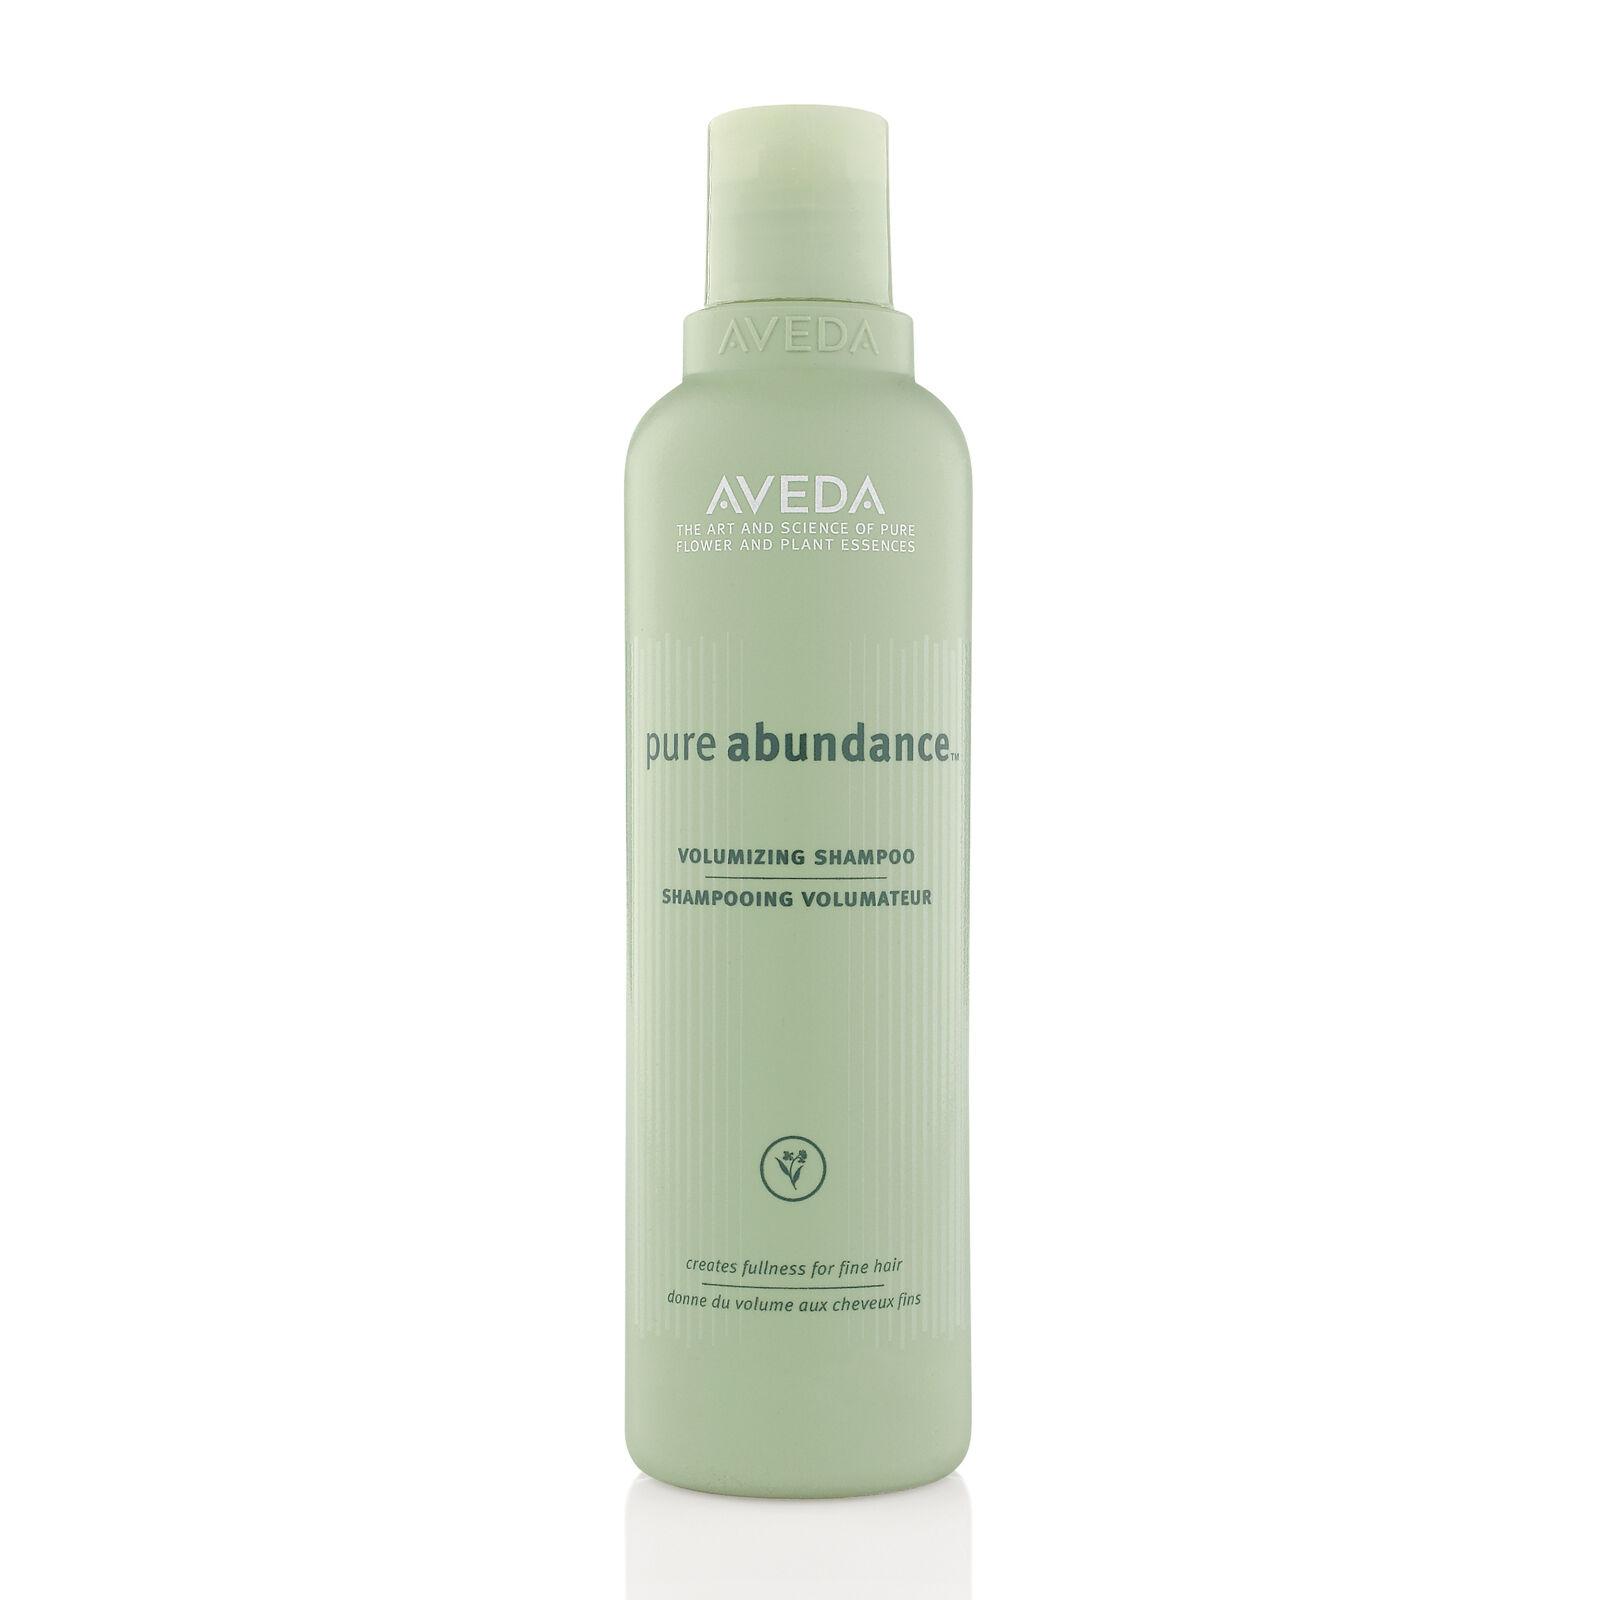 Aveda pure abundance volumizing shampoo 8.5 oz